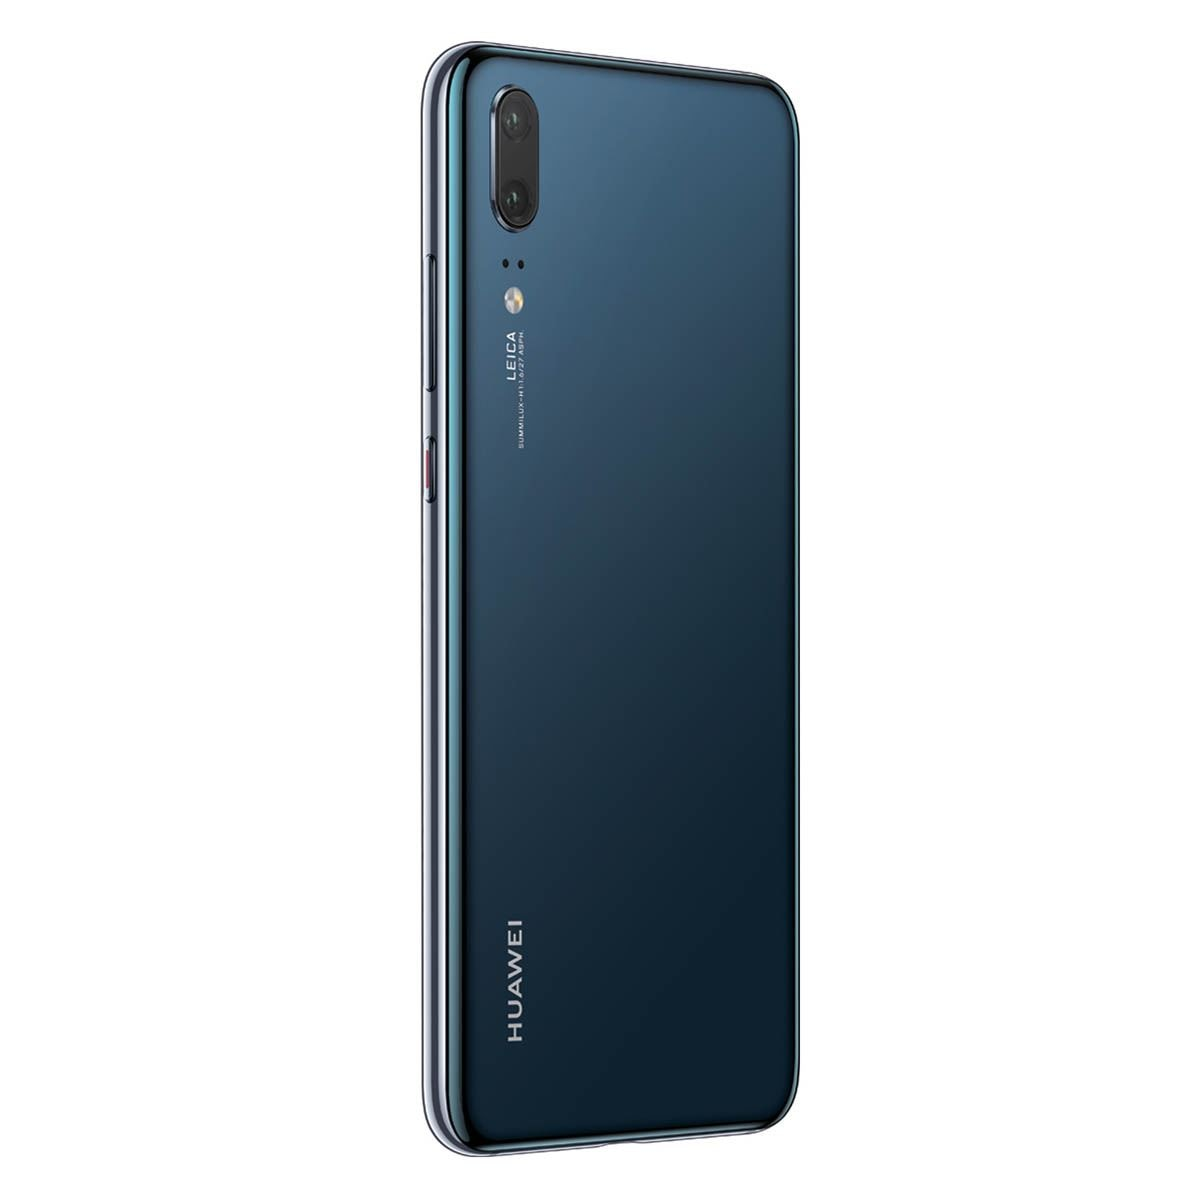 Celular huawei eml-l09 p20 azul r9 (telcel)  - Sanborns